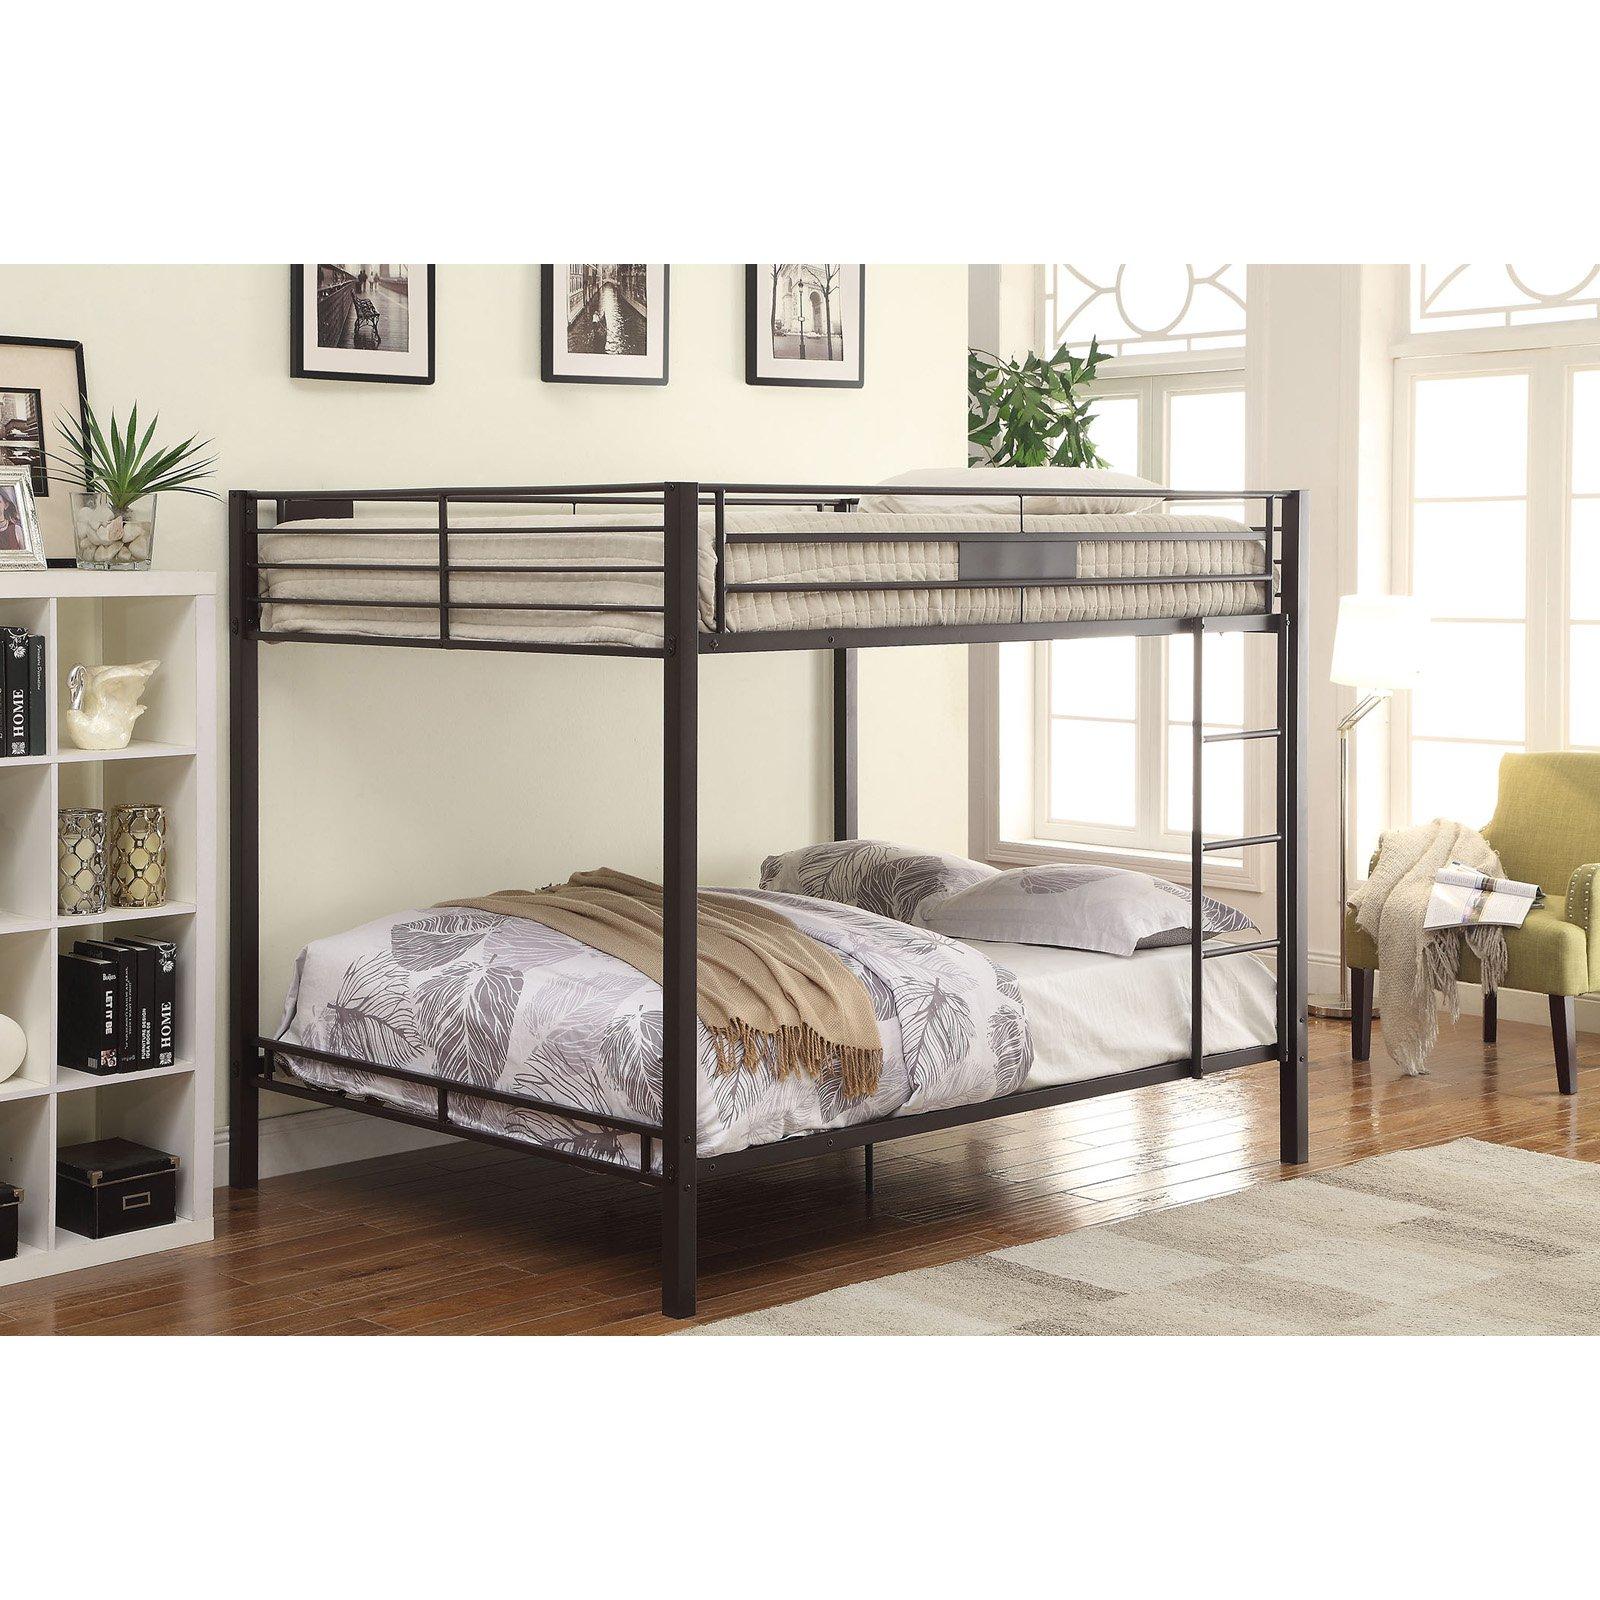 ACME Kaleb Queen over Queen Bunk Bed in Sandy Black by Acme Furniture